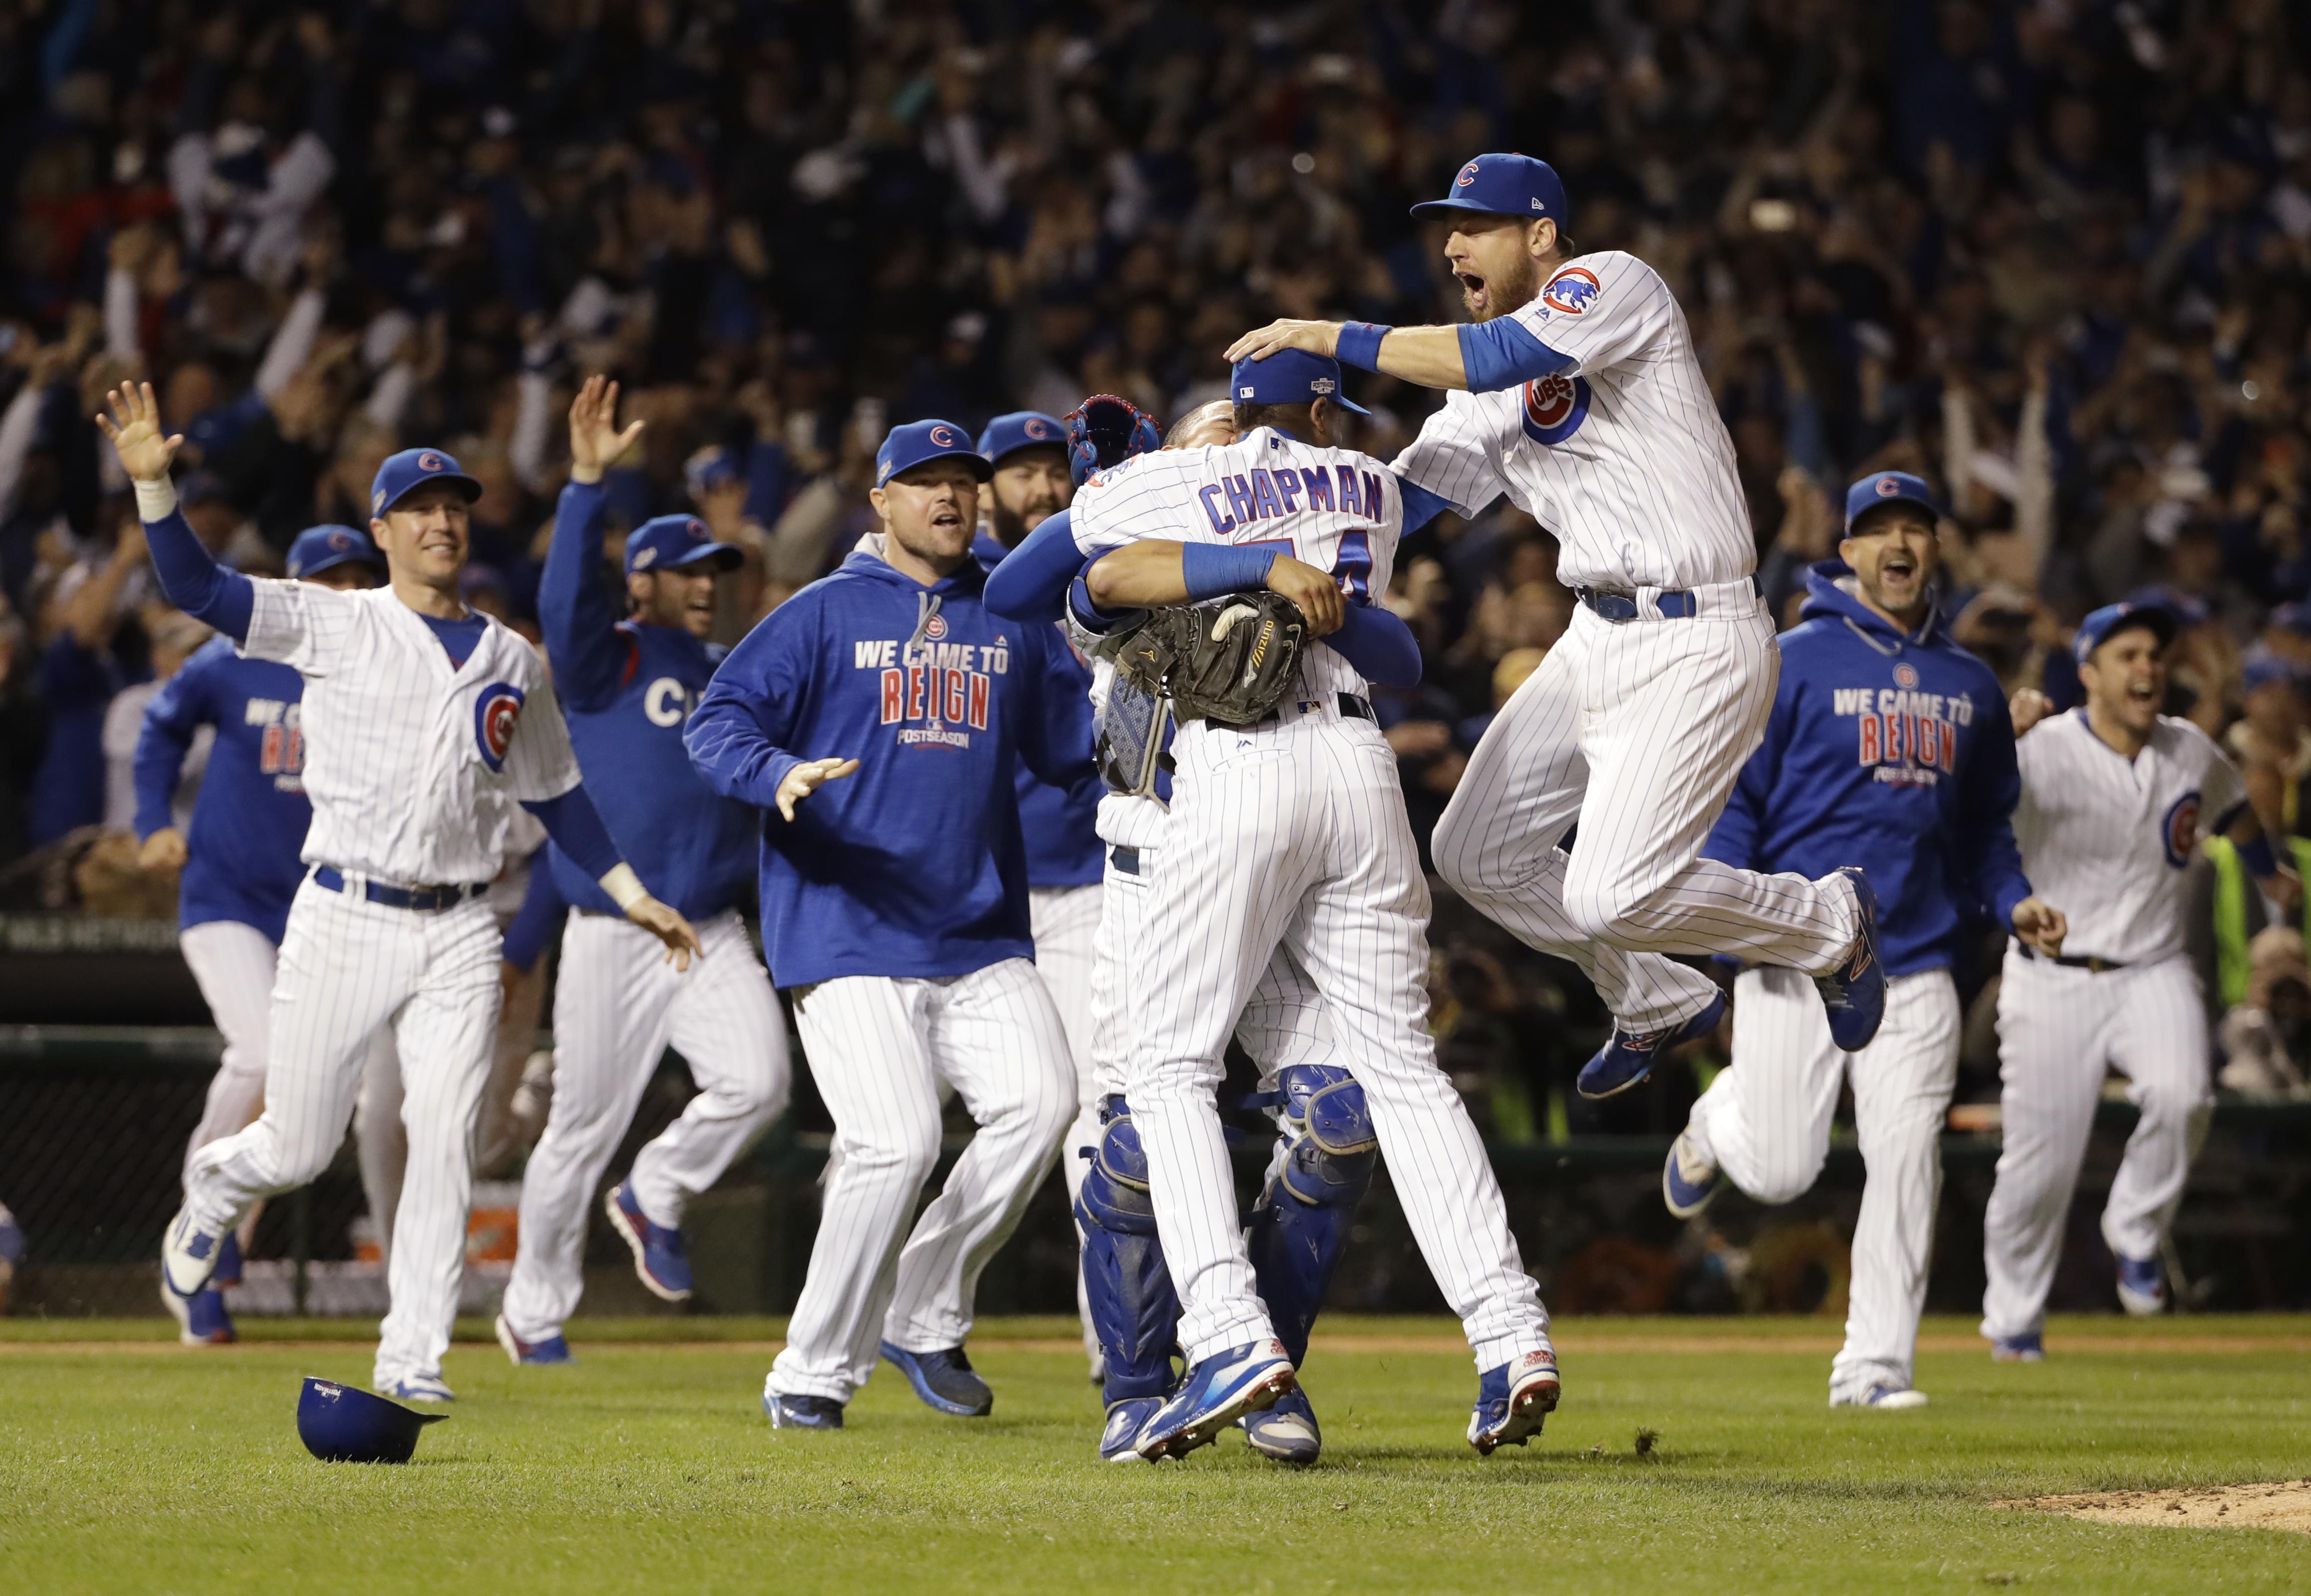 Cubs win National League pennant